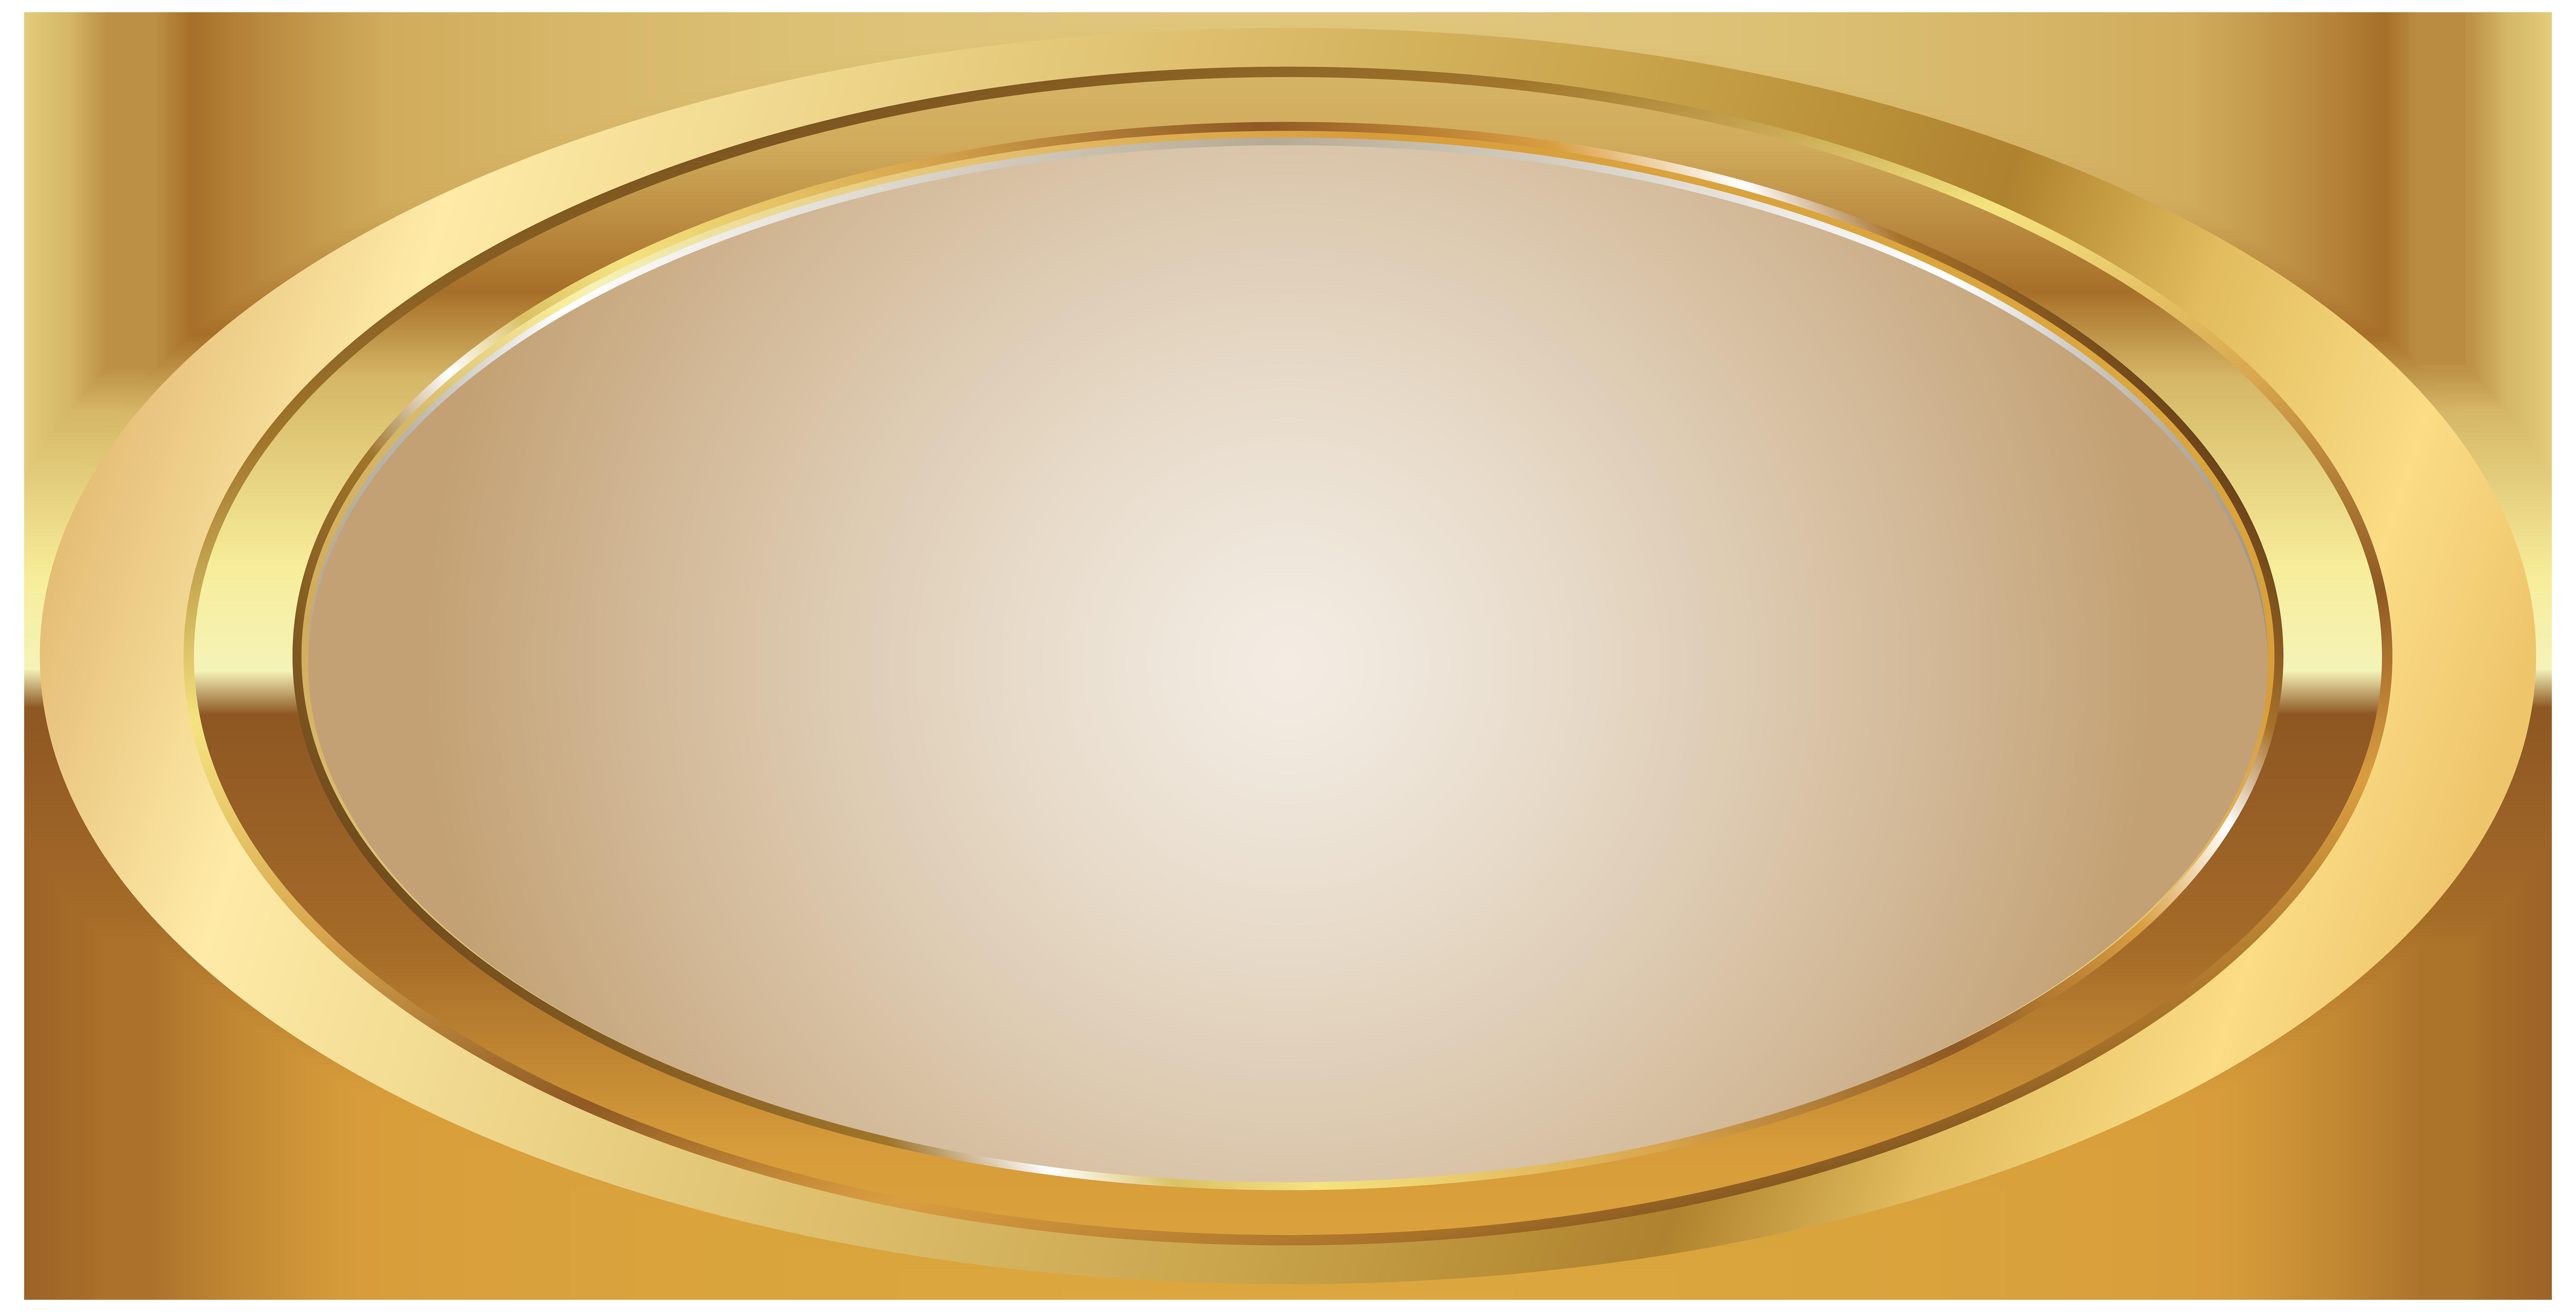 Label template png clip. Grains clipart plate